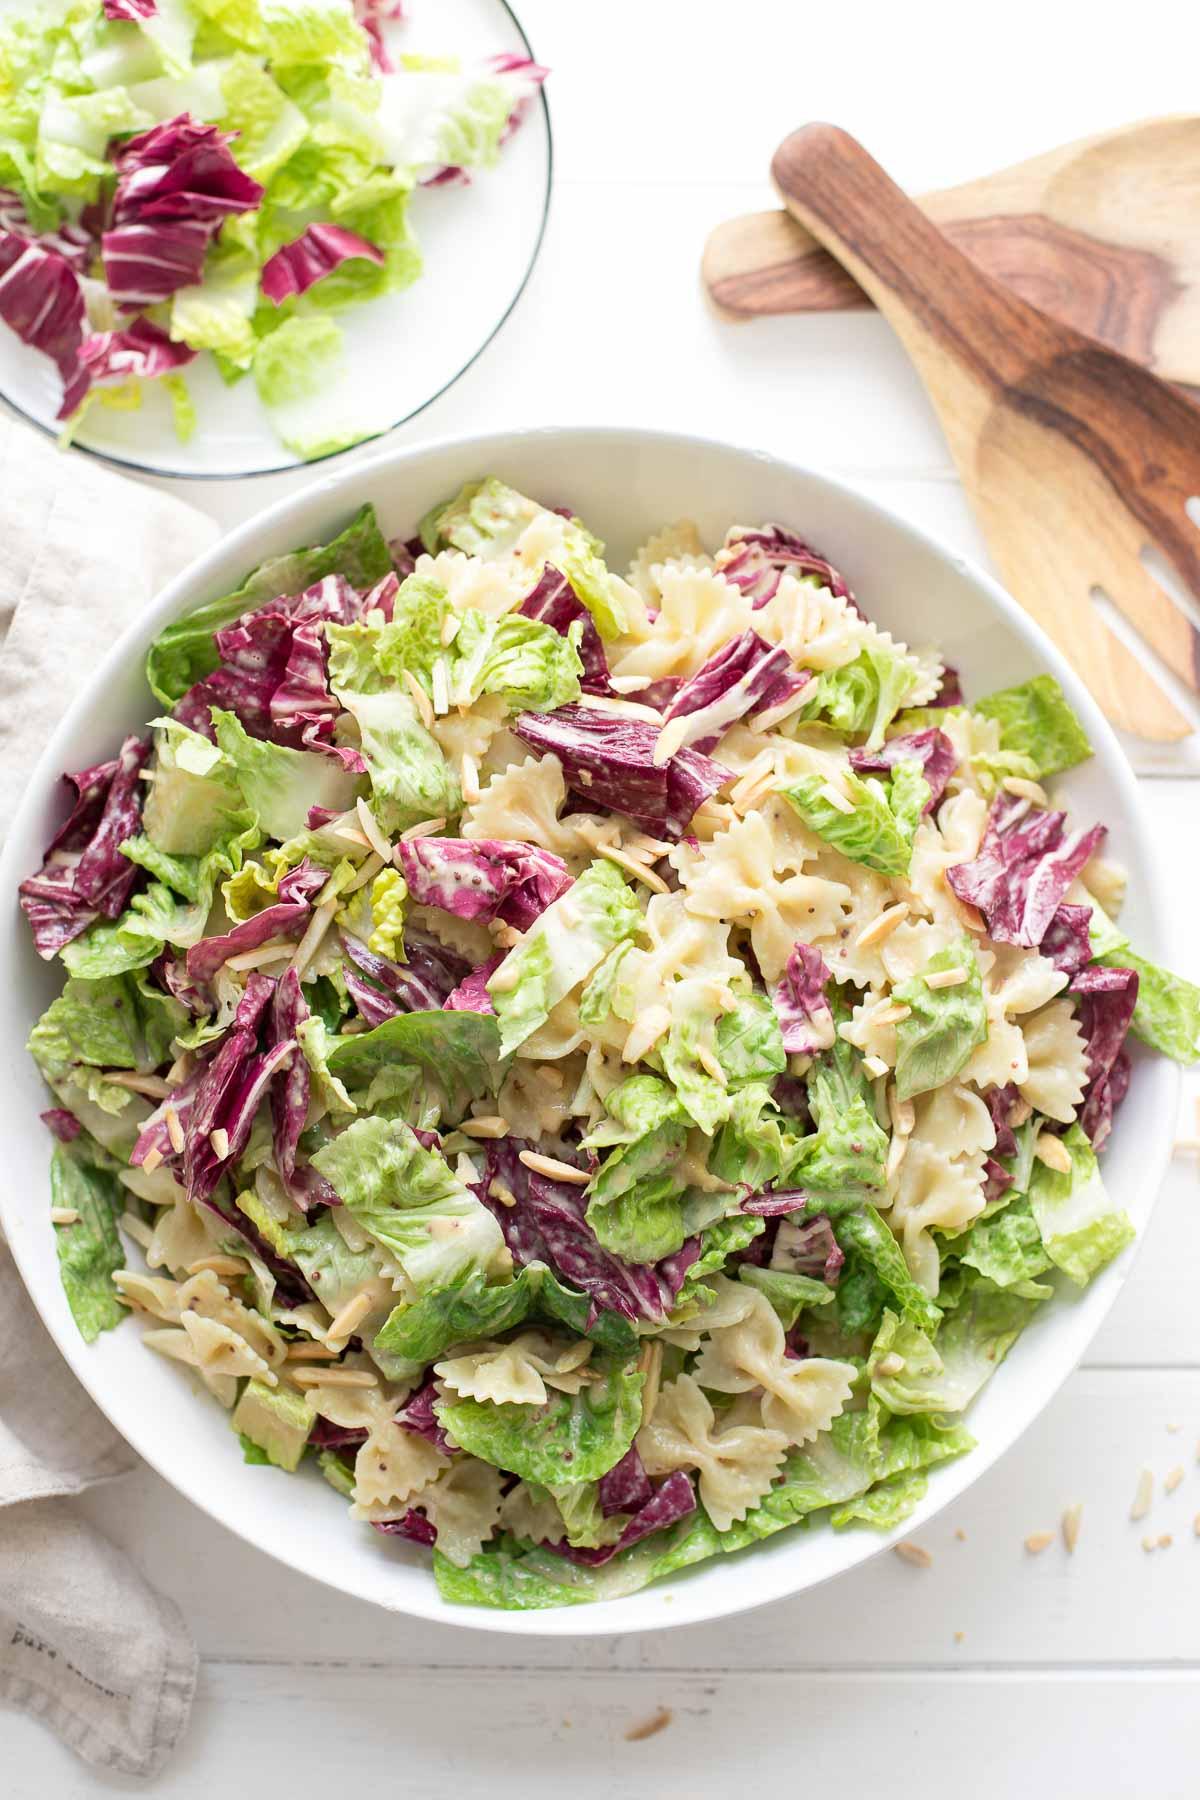 Caesar Pasta Salat with radicchio, almonds, tahini dressing (vegan)